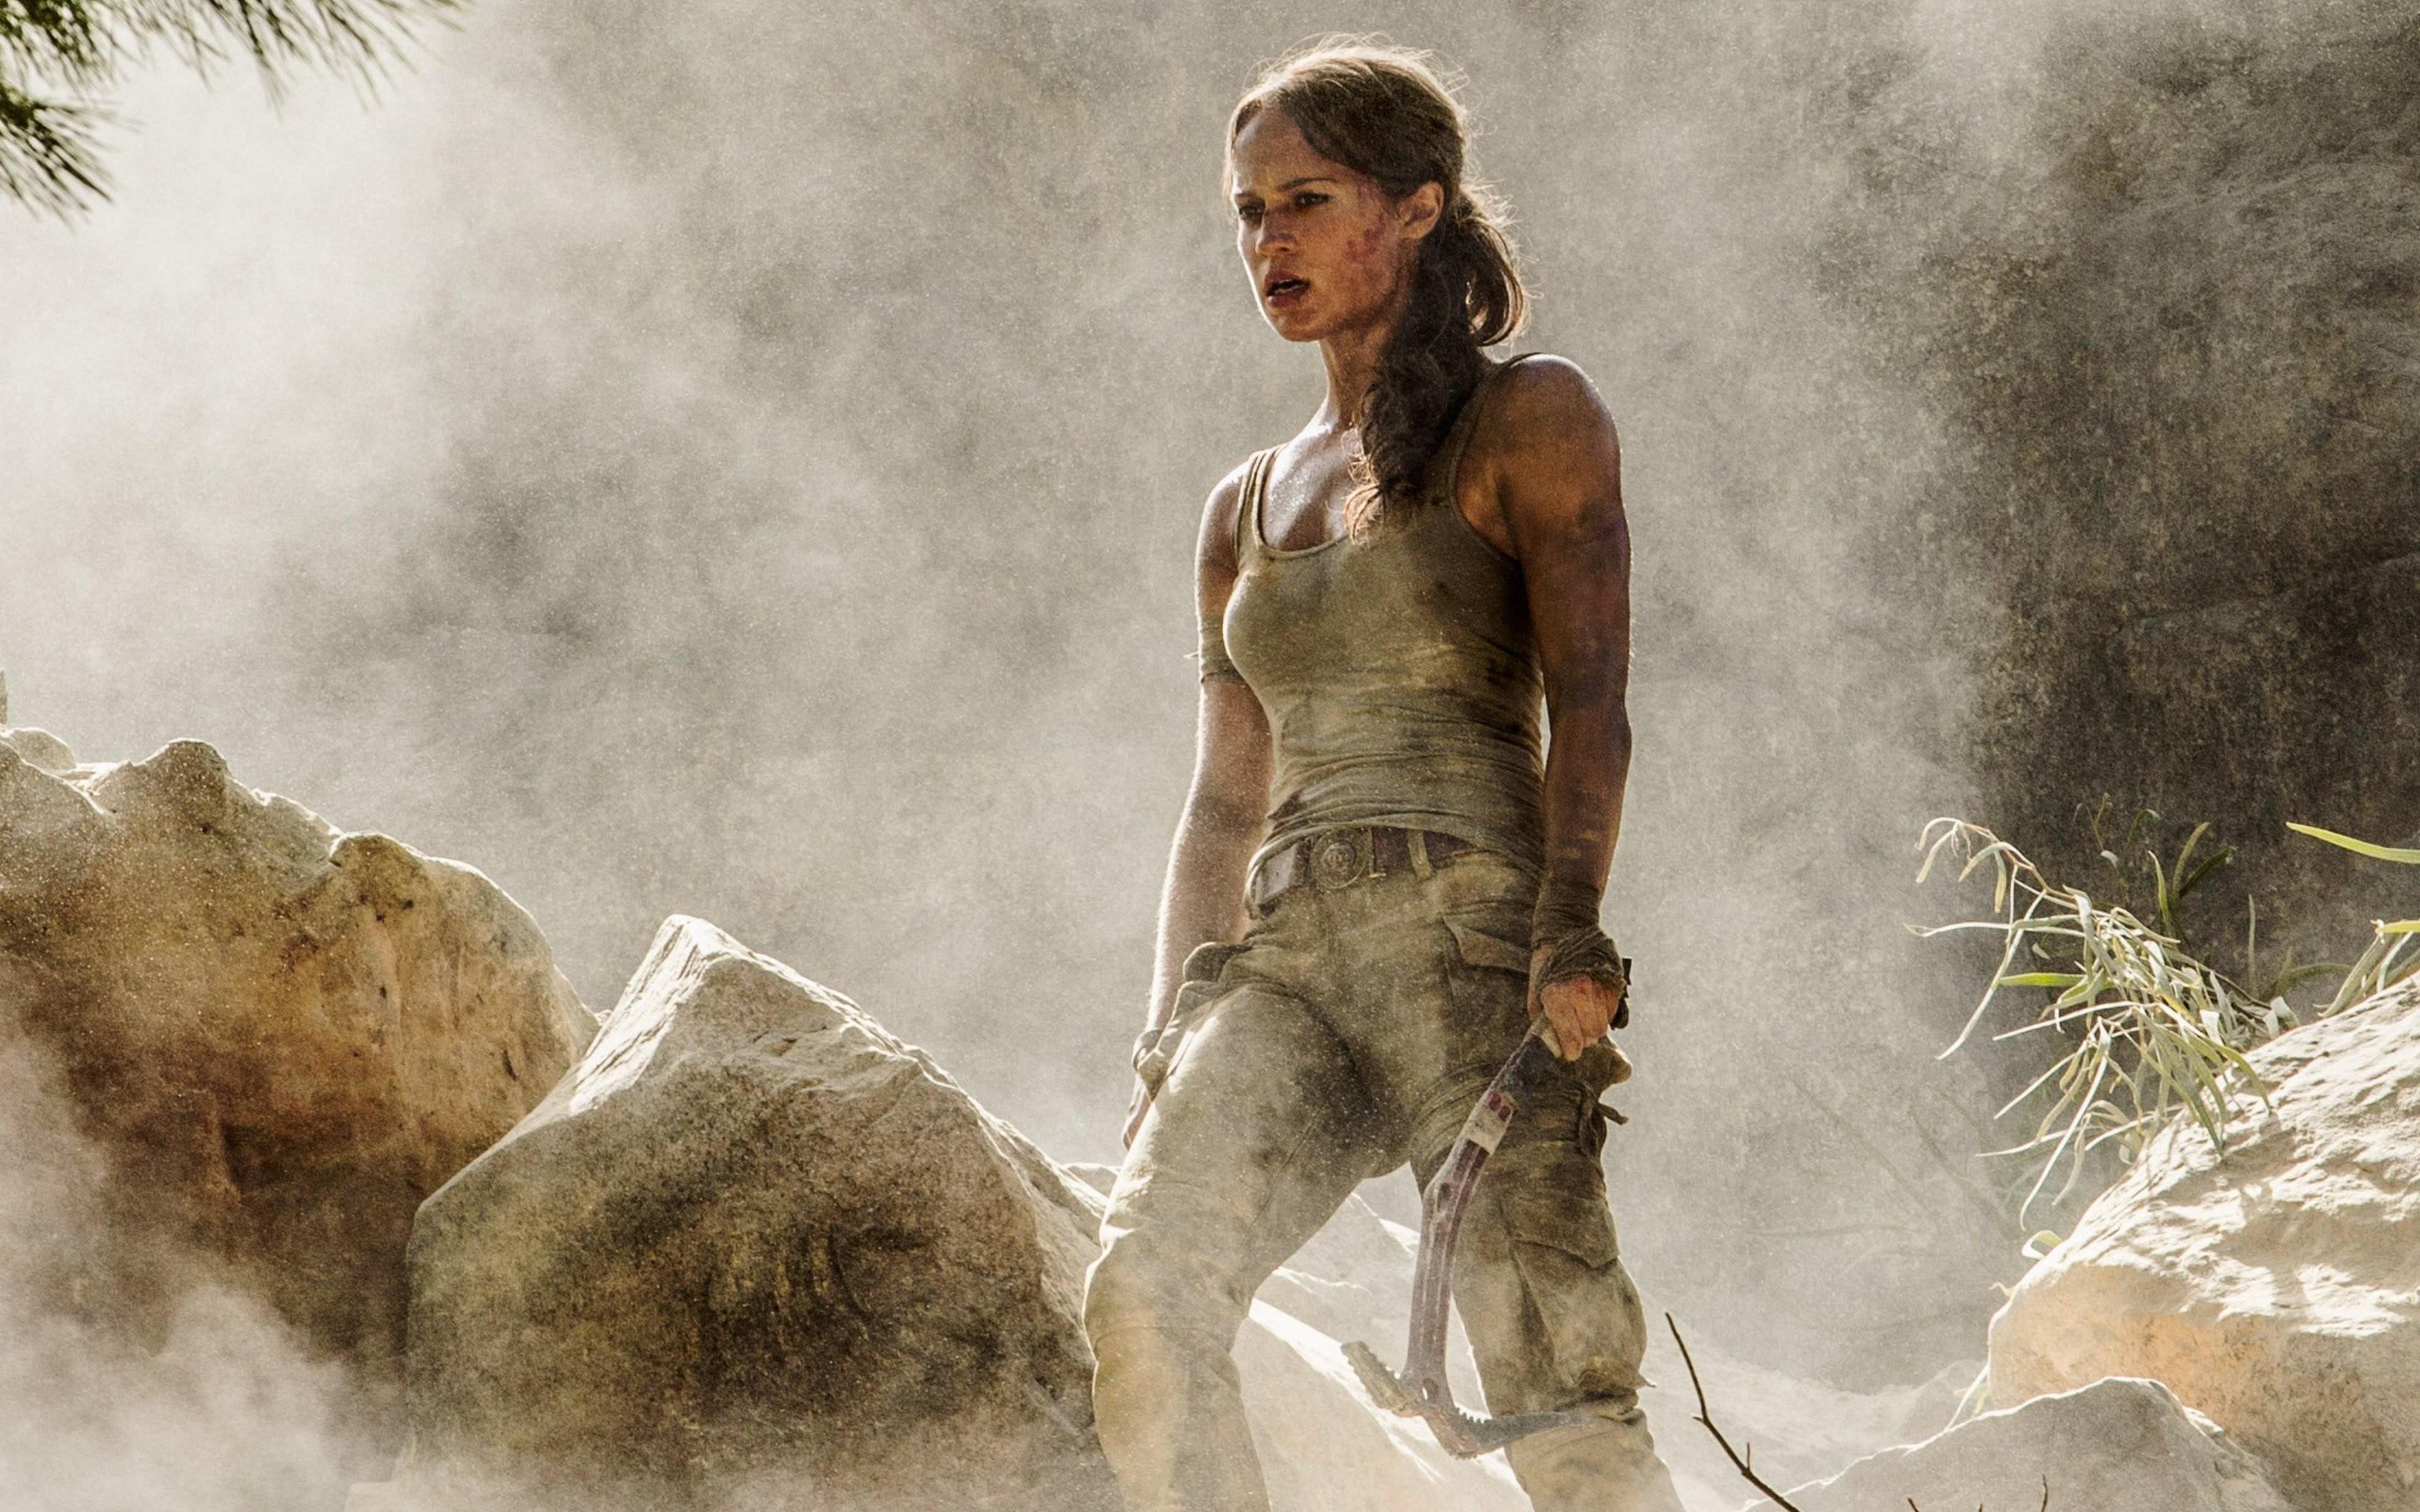 Wallpaper Lara Croft Tomb Raider Alicia Vikander 4k Movies 15953